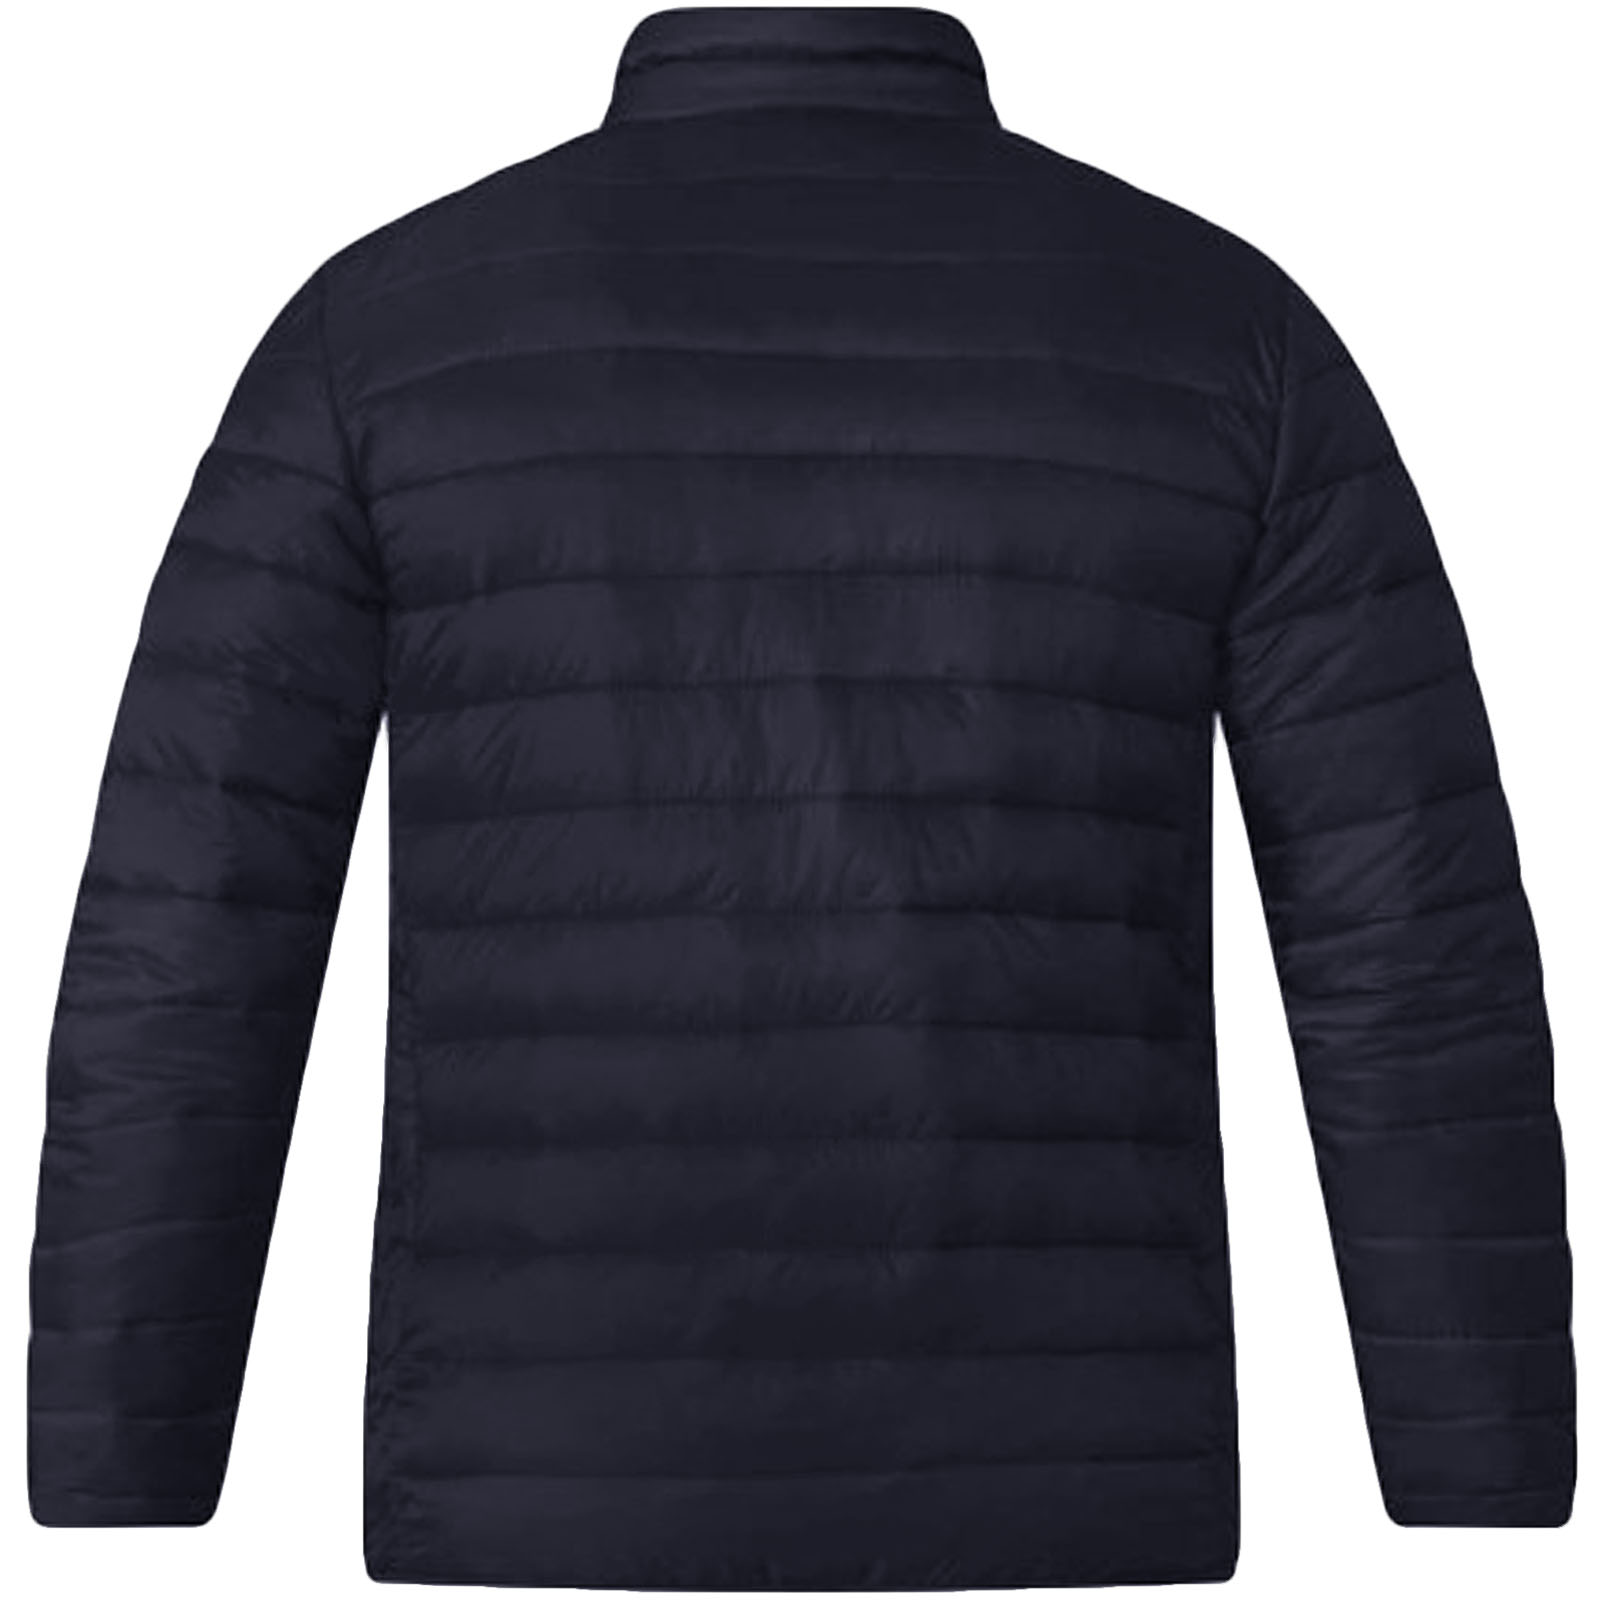 Duke D555 Mens Bastian King Size Big Tall Long Sleeve Zip Up Padded Jacket Coat